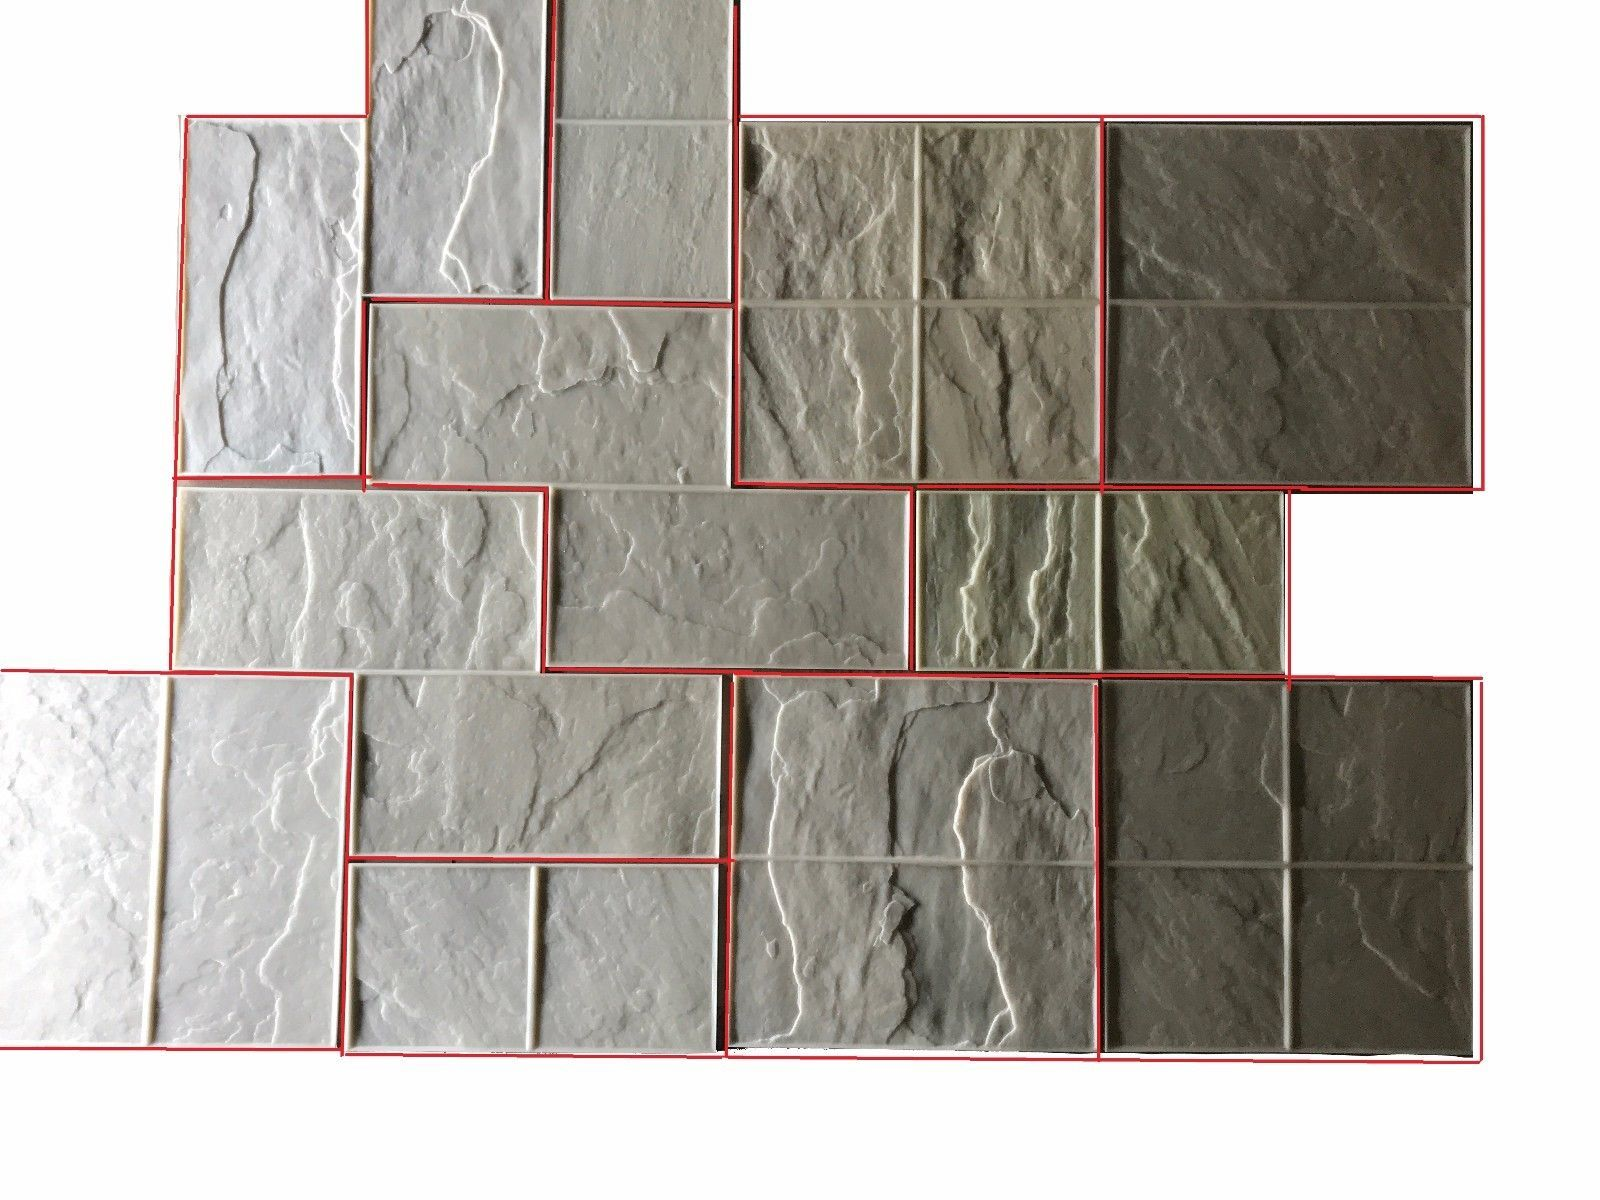 Concrete Stamp Slate Ashlar Concrete Stamp Flex Stamp Floppy Mat SM 2302/F